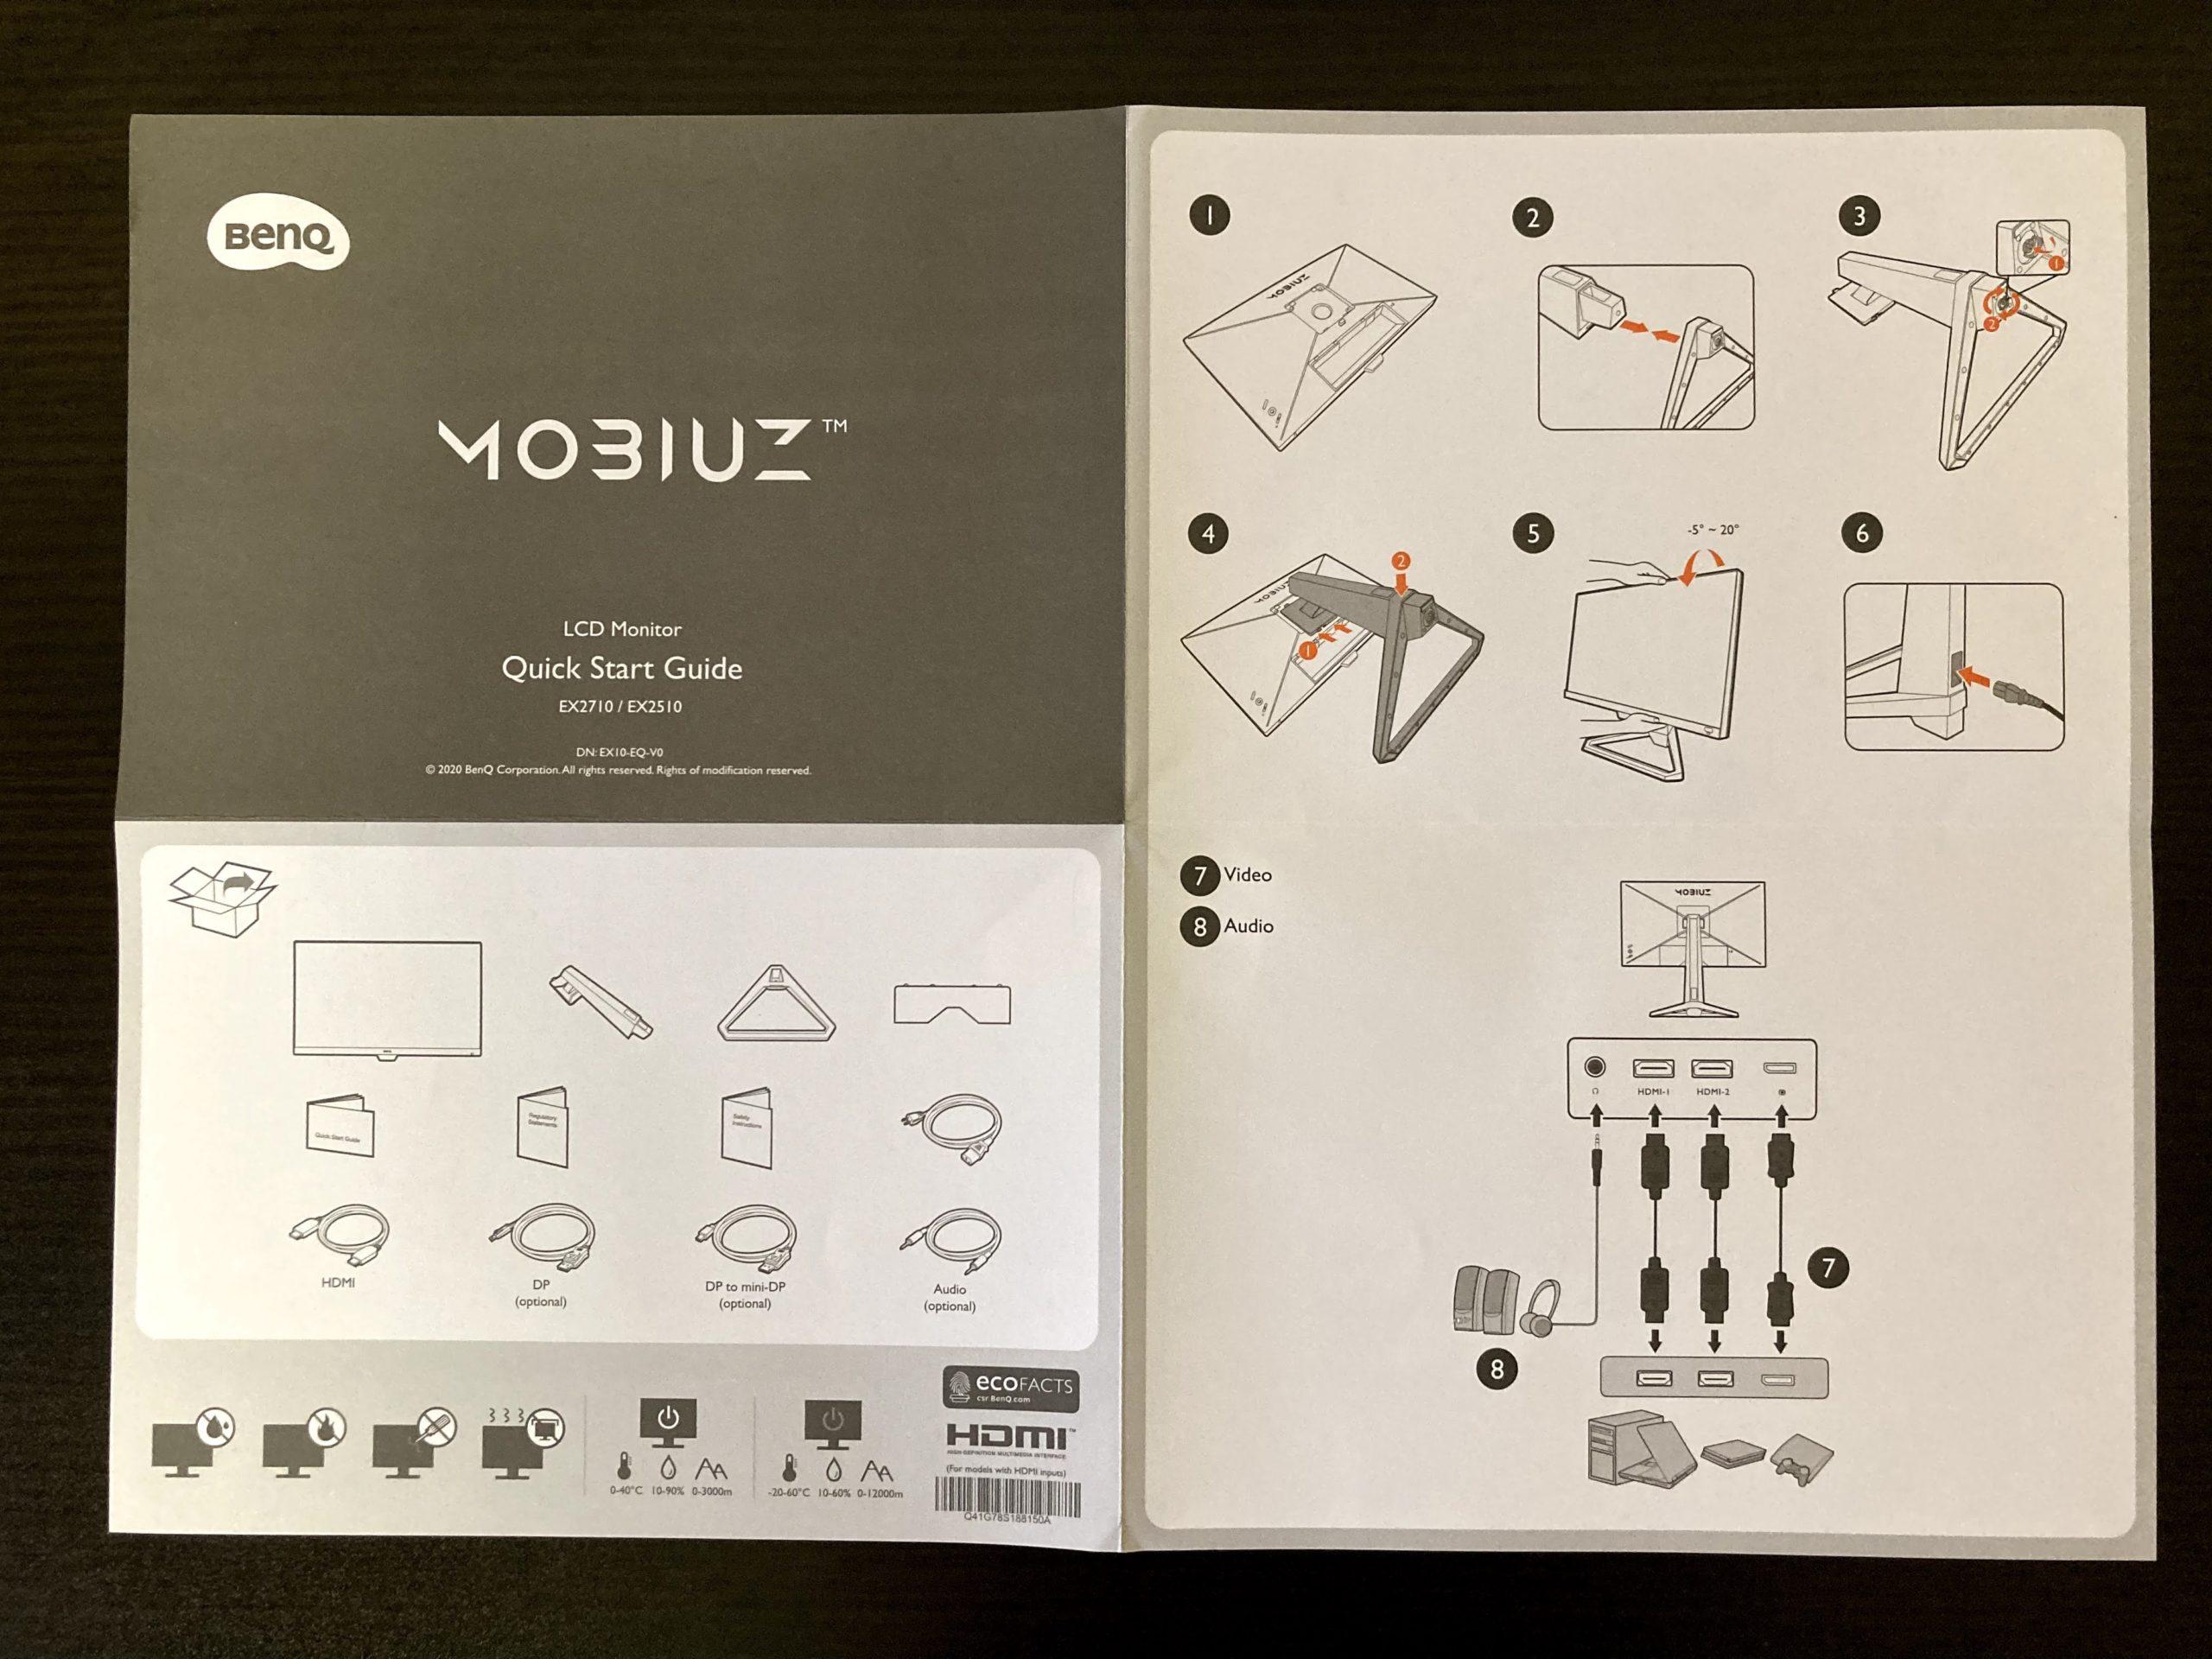 BenQ MOBIUZ EX2510 Quick Start Guide